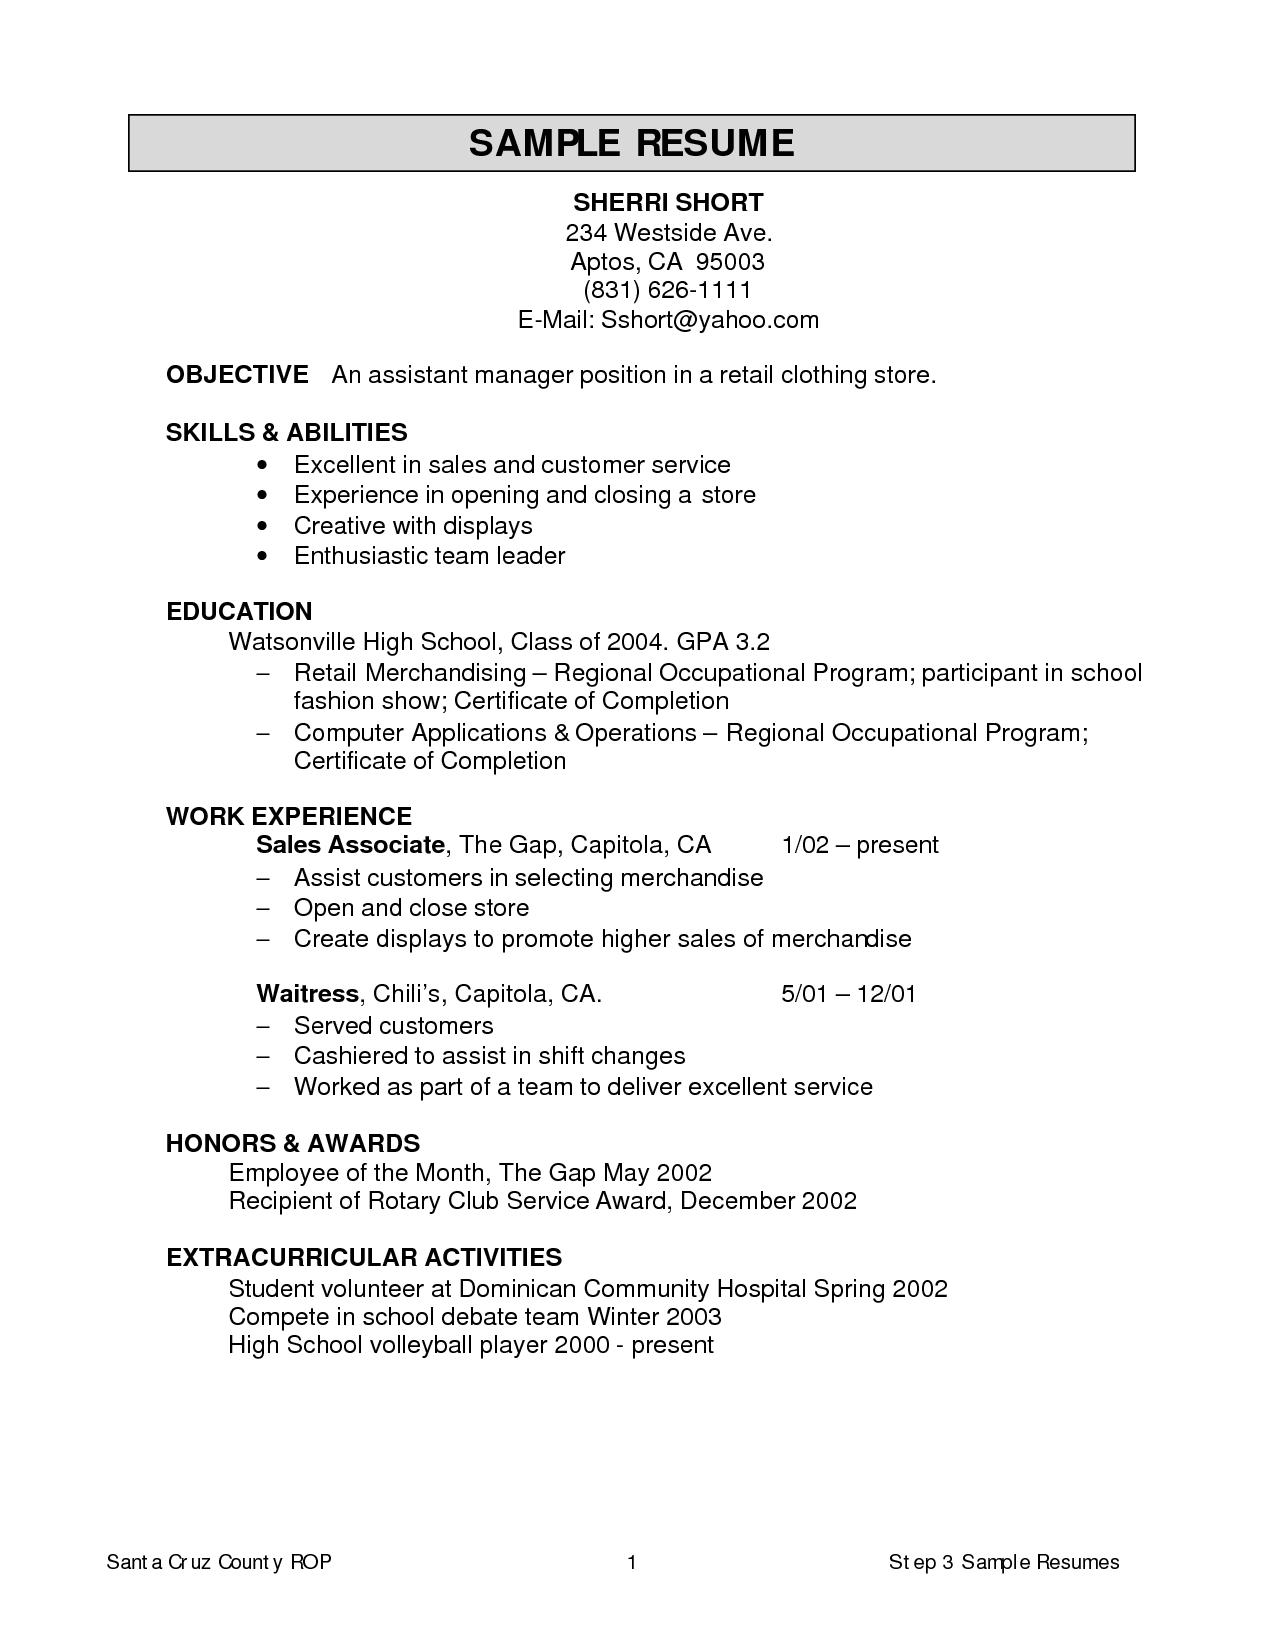 Retail Resume Executive Example Template Store Sample Cover Letter Resume Sample Resume Sample Resume Templates